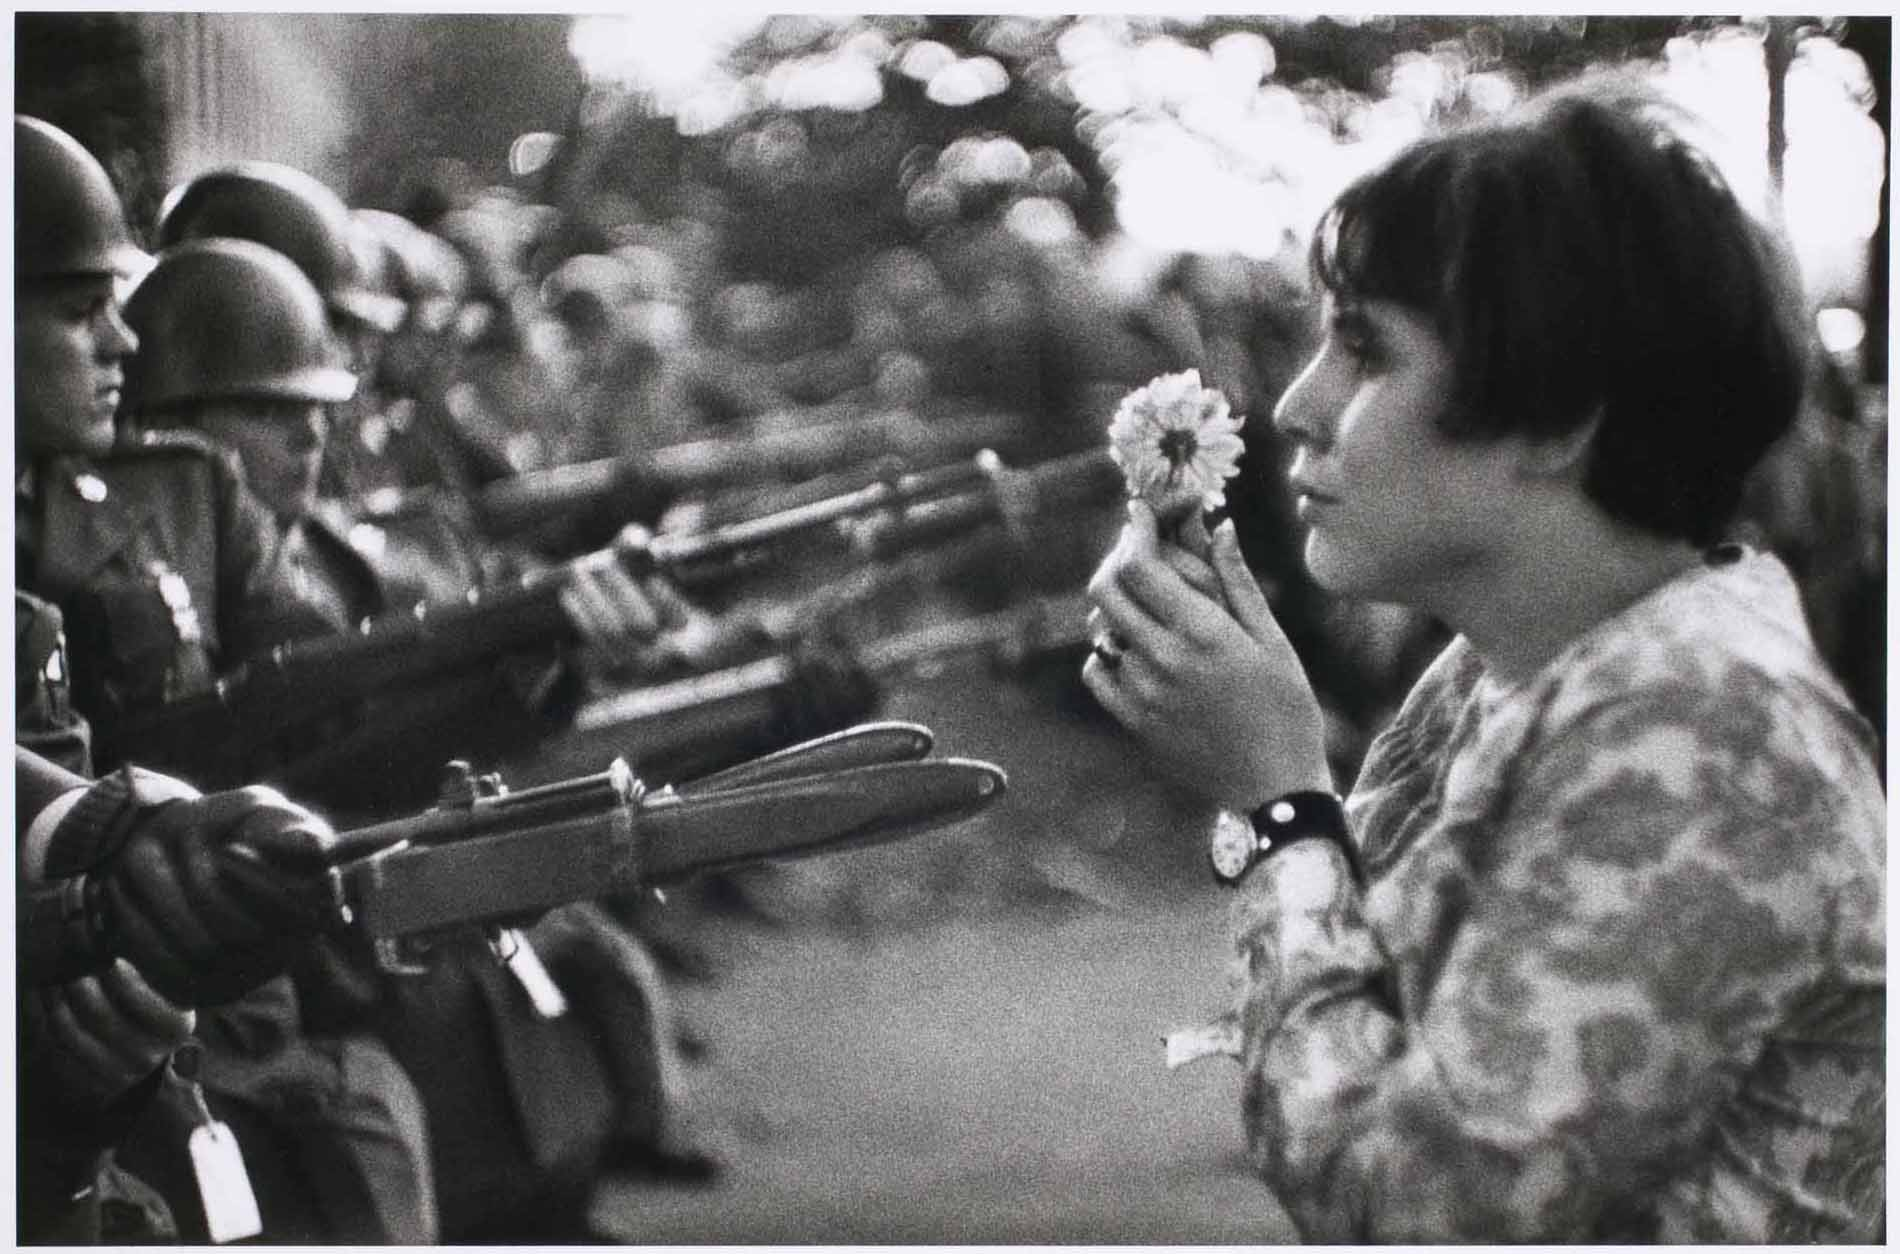 Hippie frente a soldados (1967)